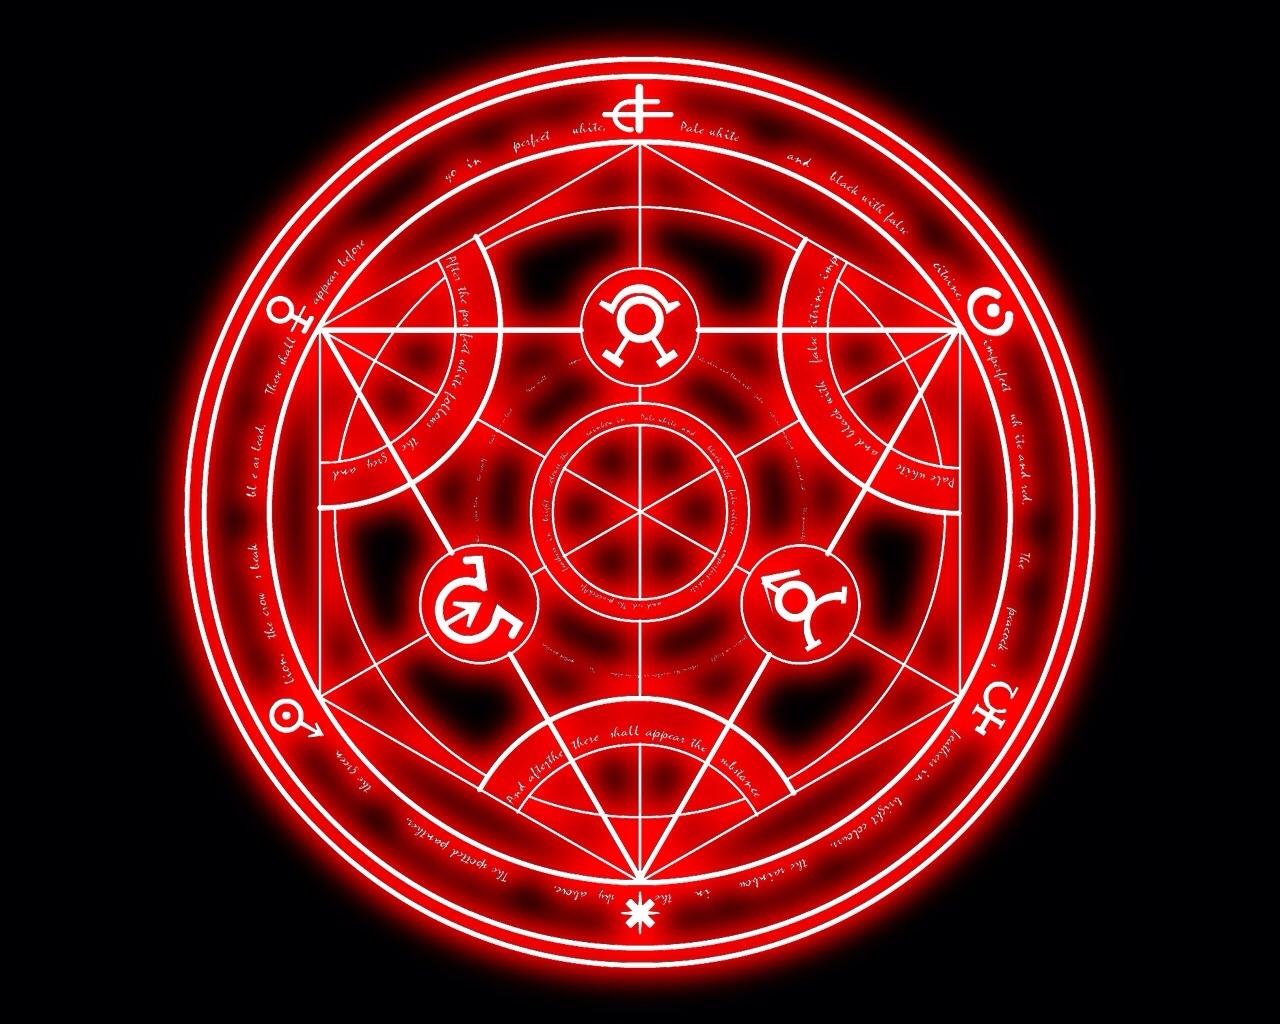 fullmetal alchemist - human transmutation circle | random | pinterest